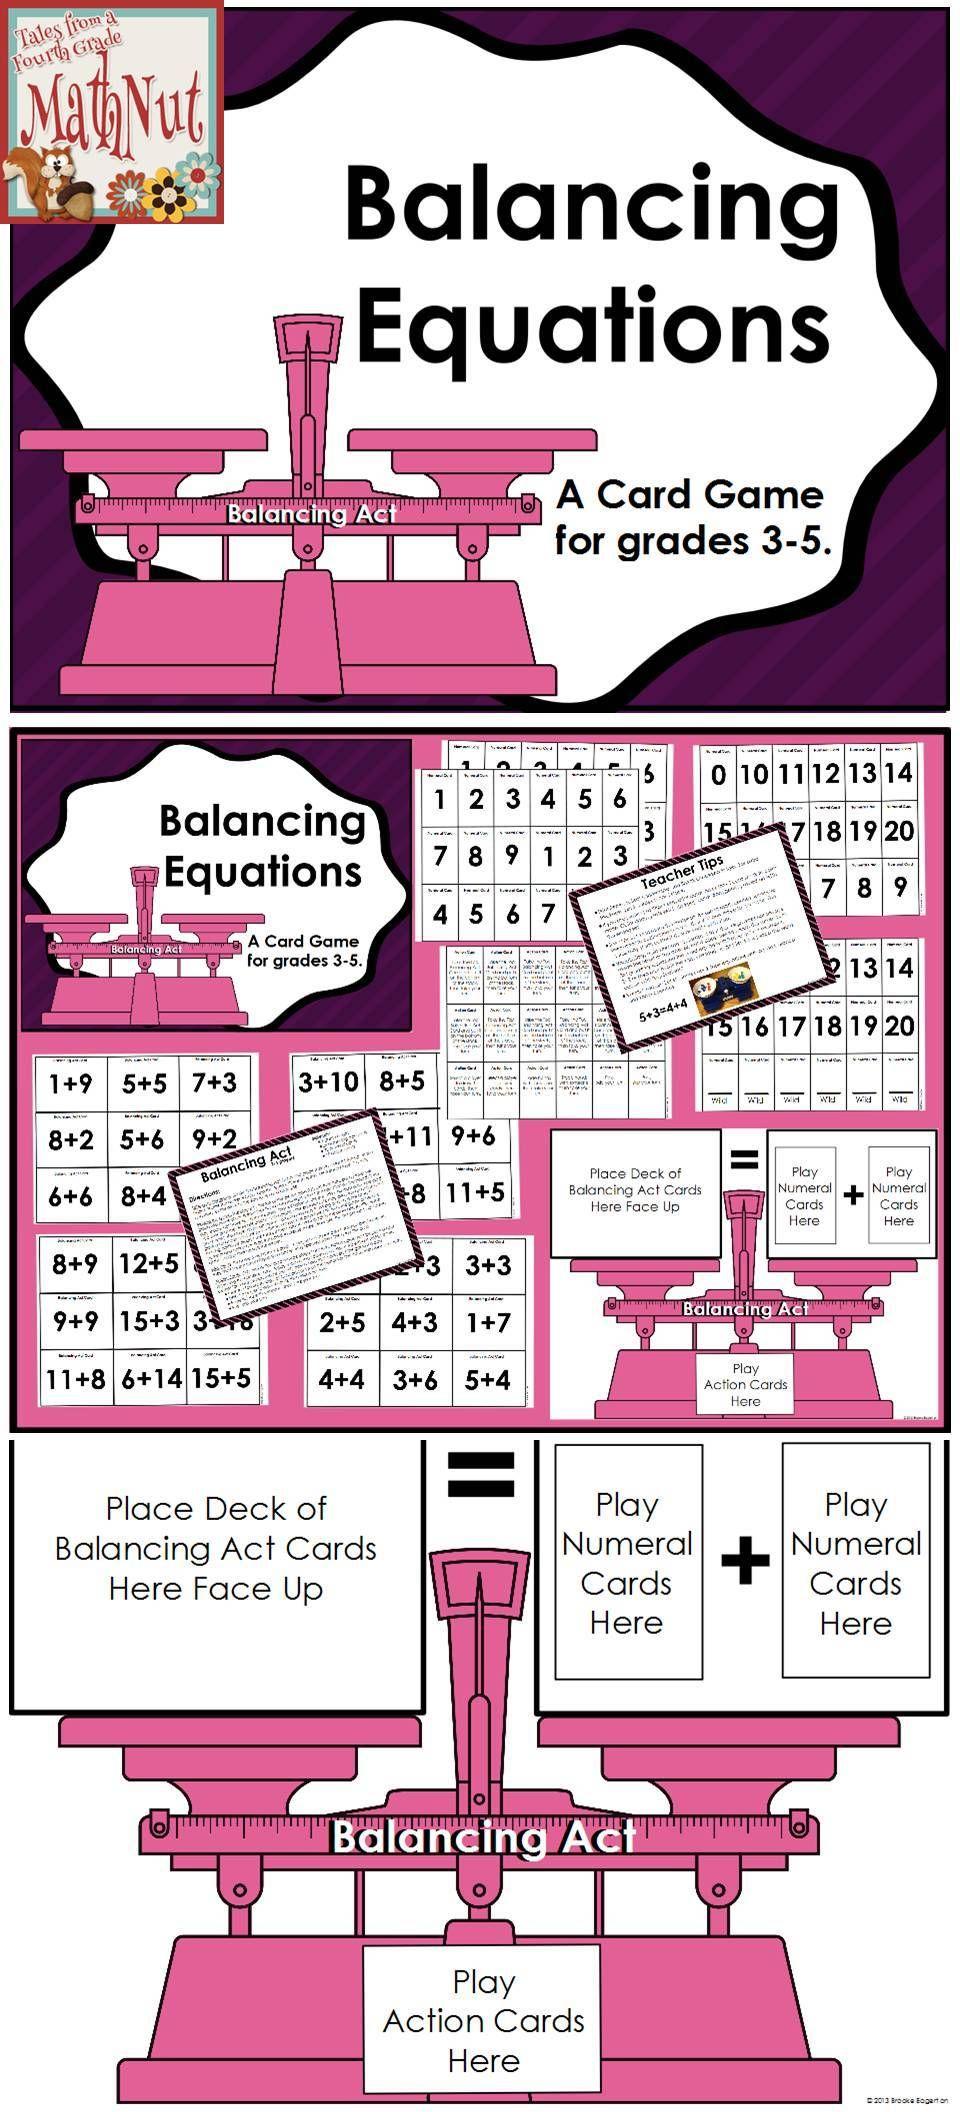 Balancing Addition Equations Addition Card Game Education Math Balancing Equations Math Resources Balancing addition equations game